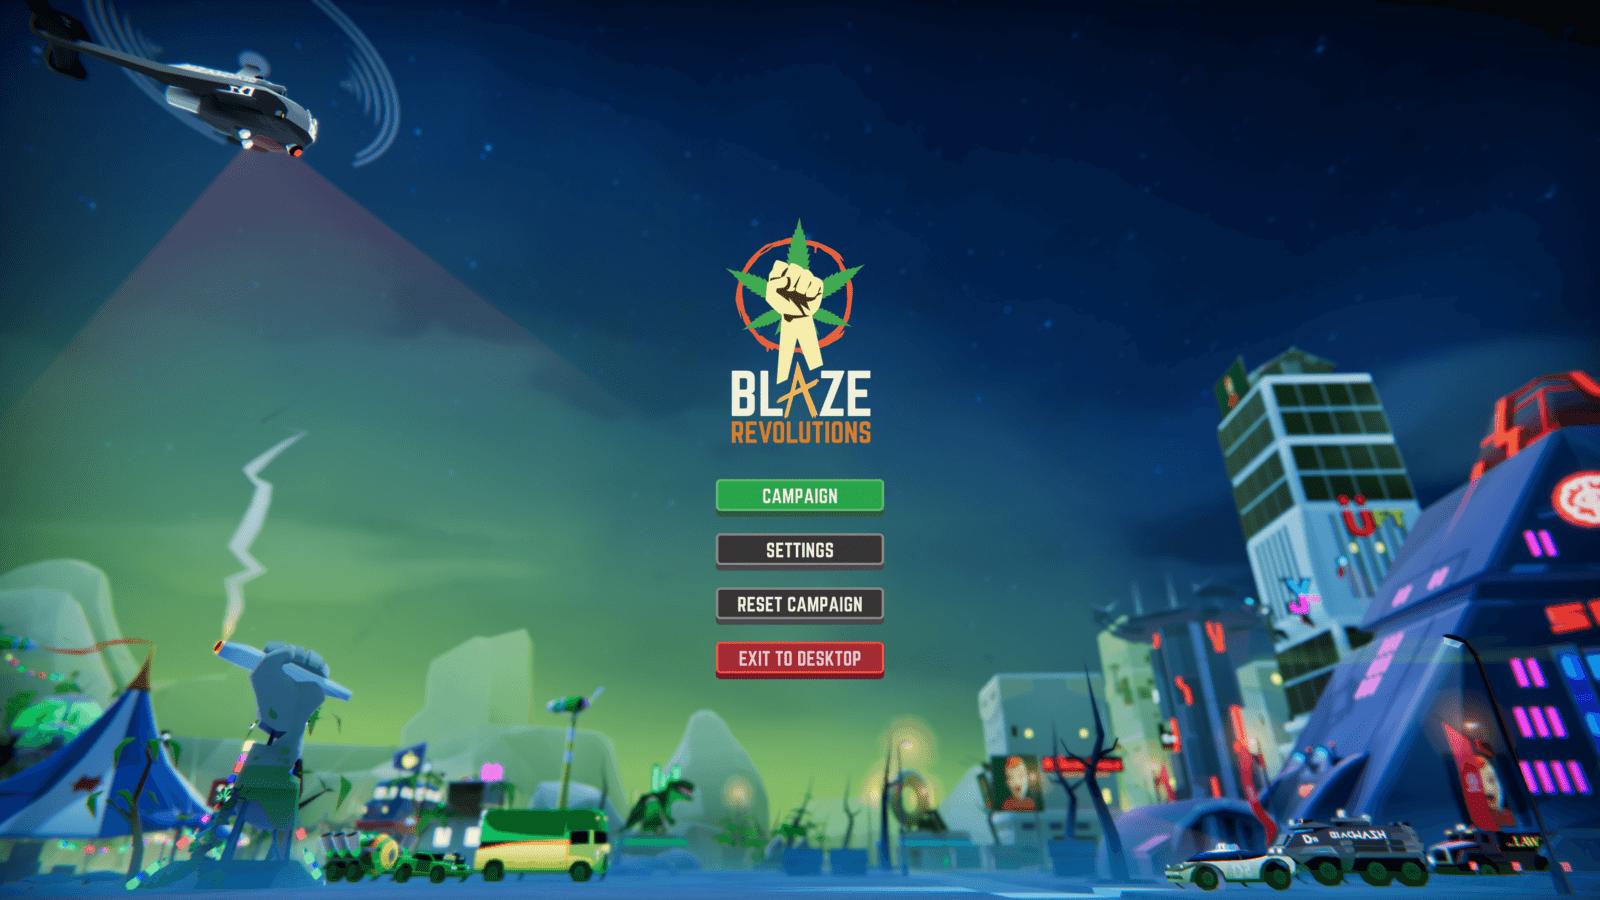 Blaze Revolutions297.6871